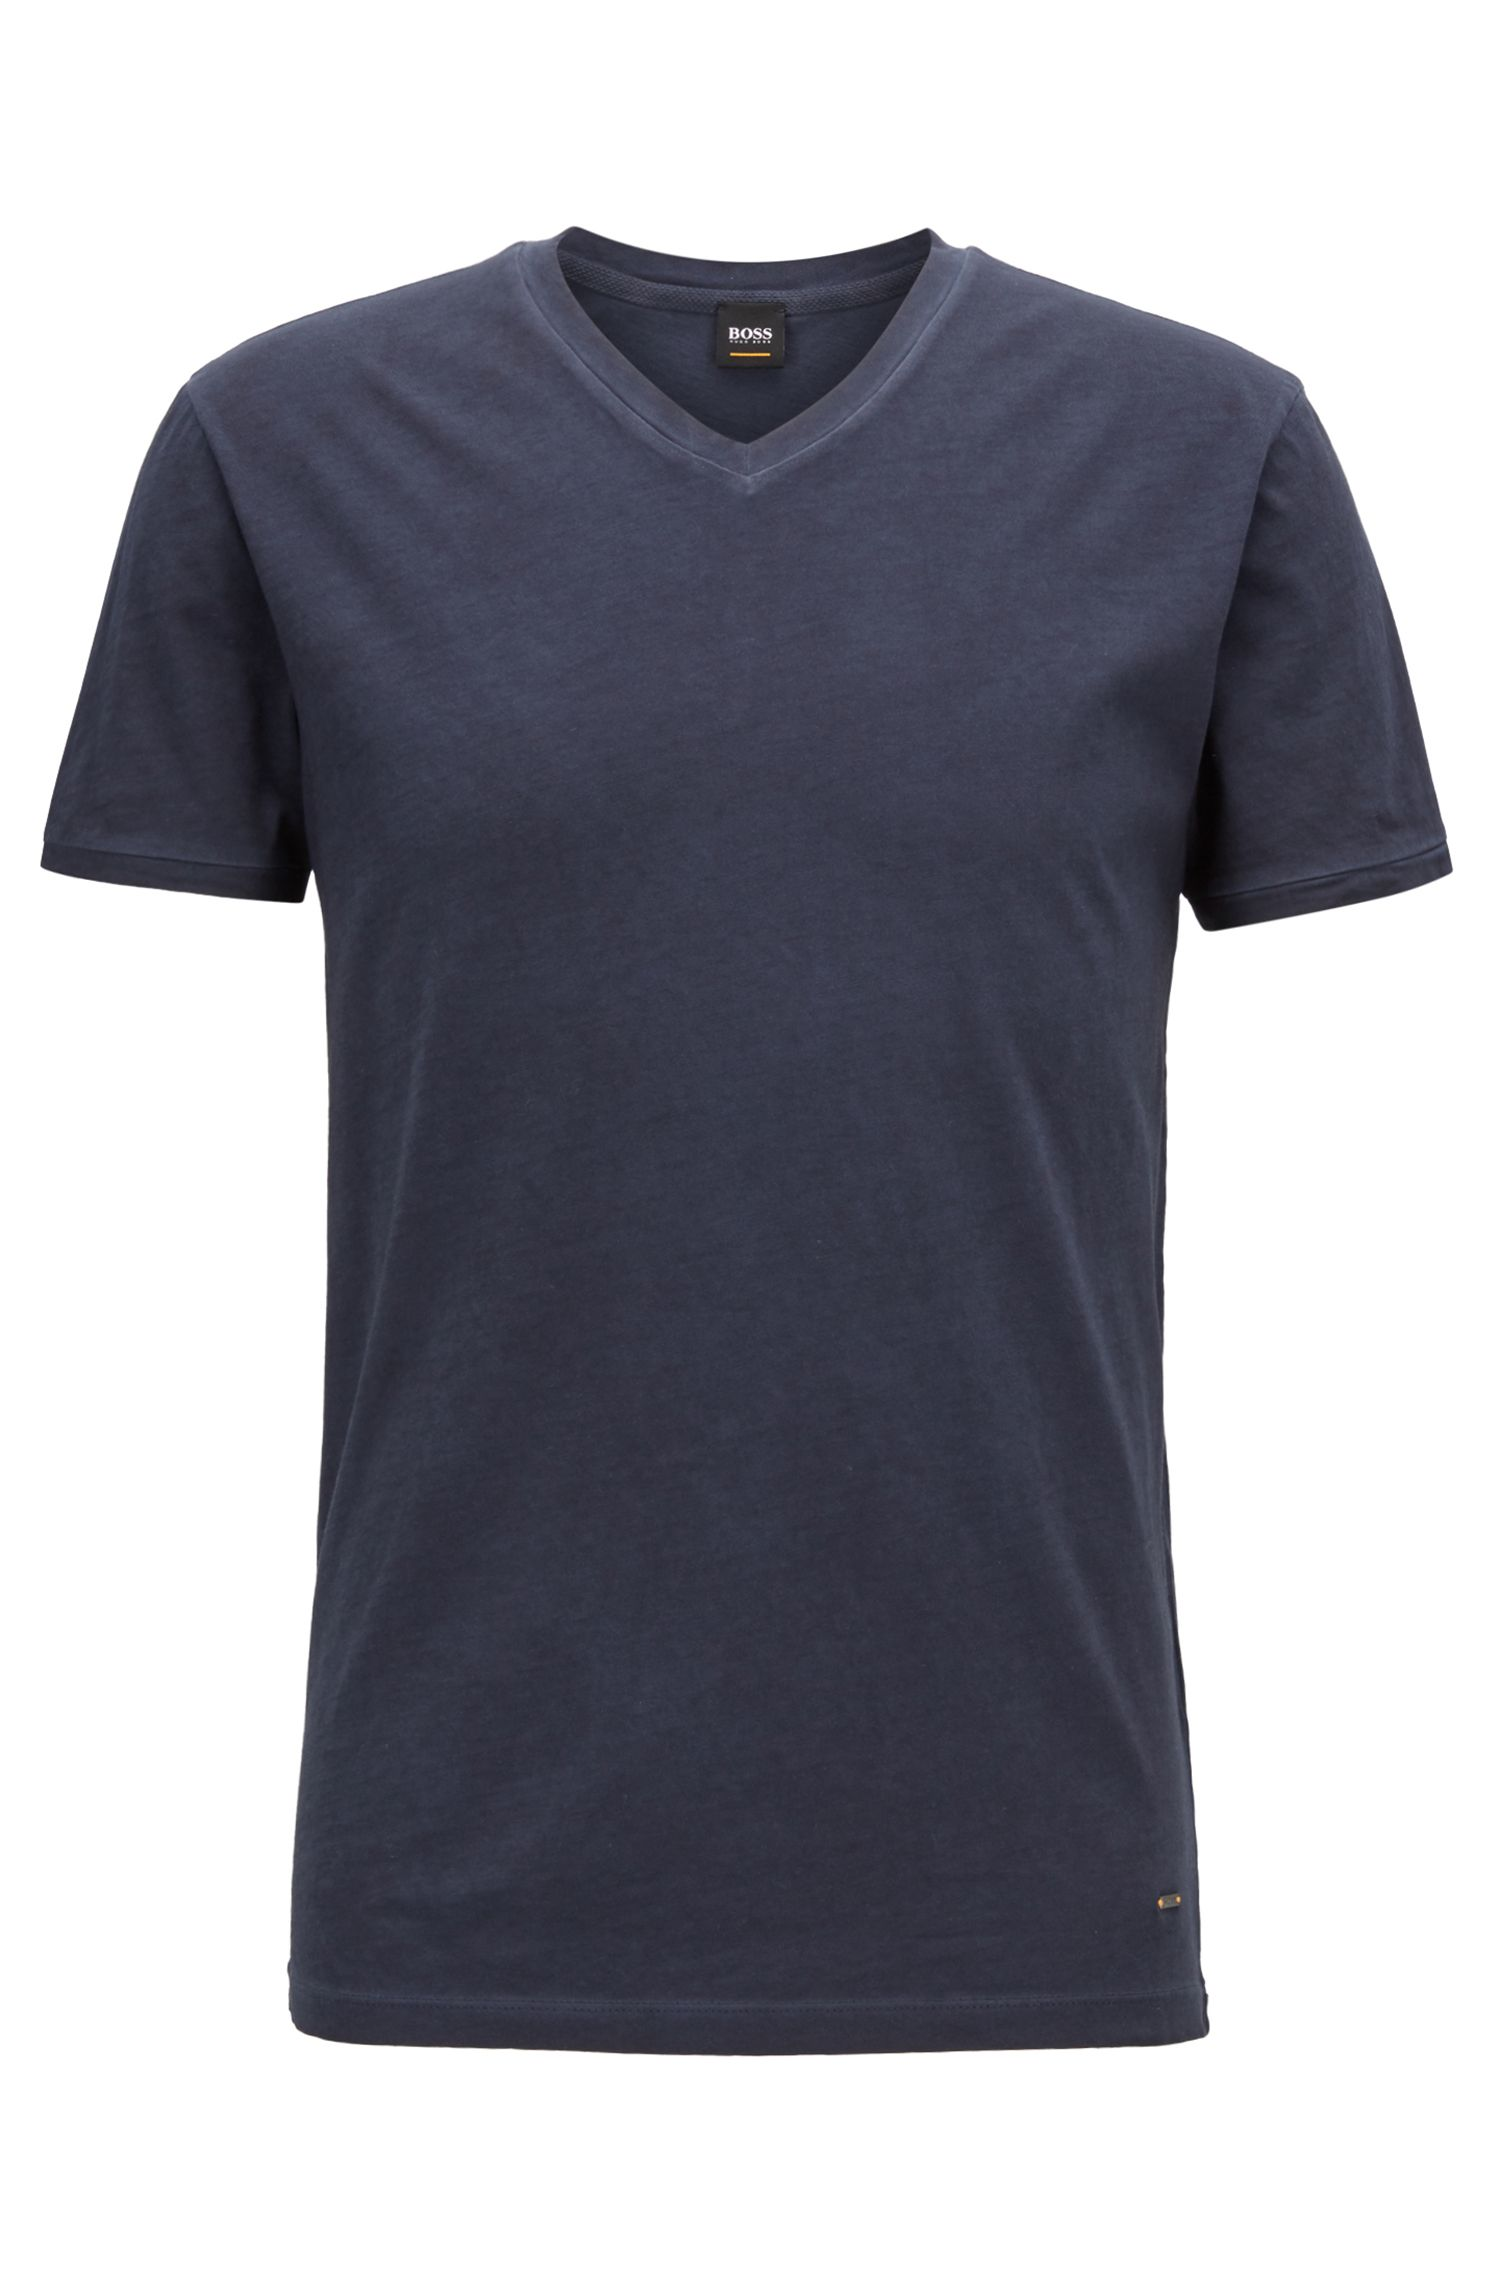 Regular-Fit T-Shirt aus Baumwolle mit V-Ausschnitt